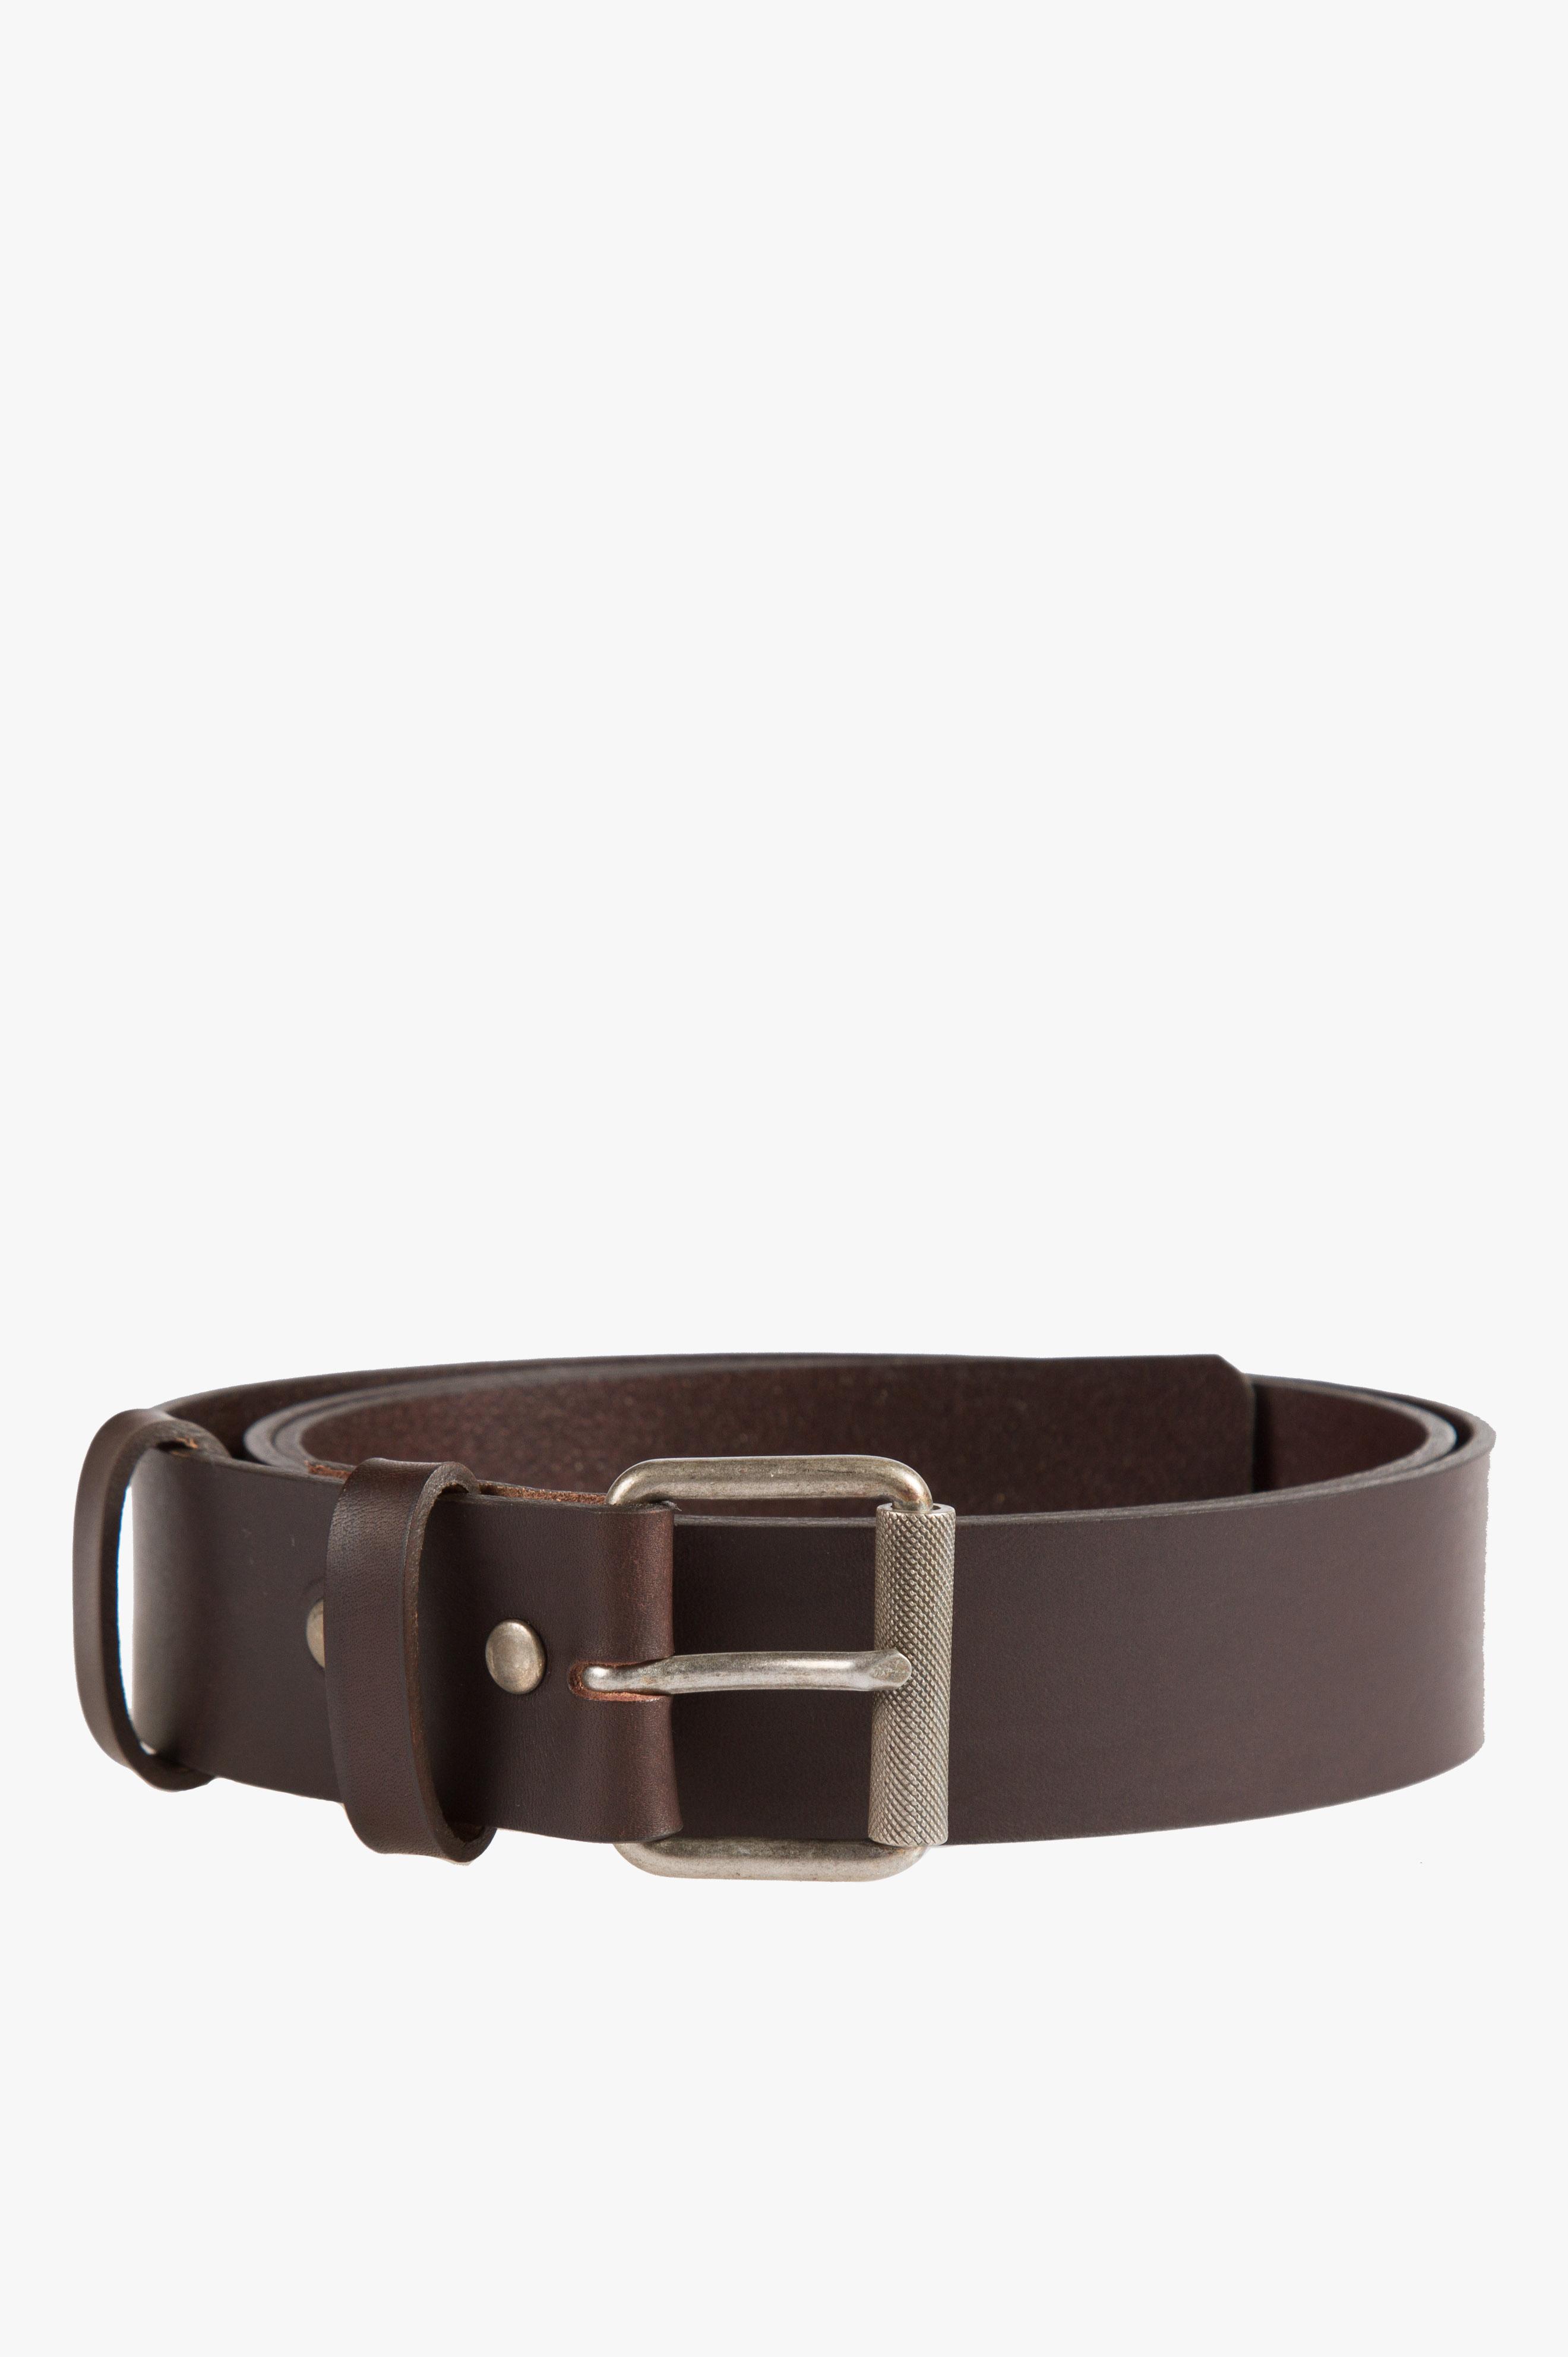 Virgile Belt Dark Chestnut Brown